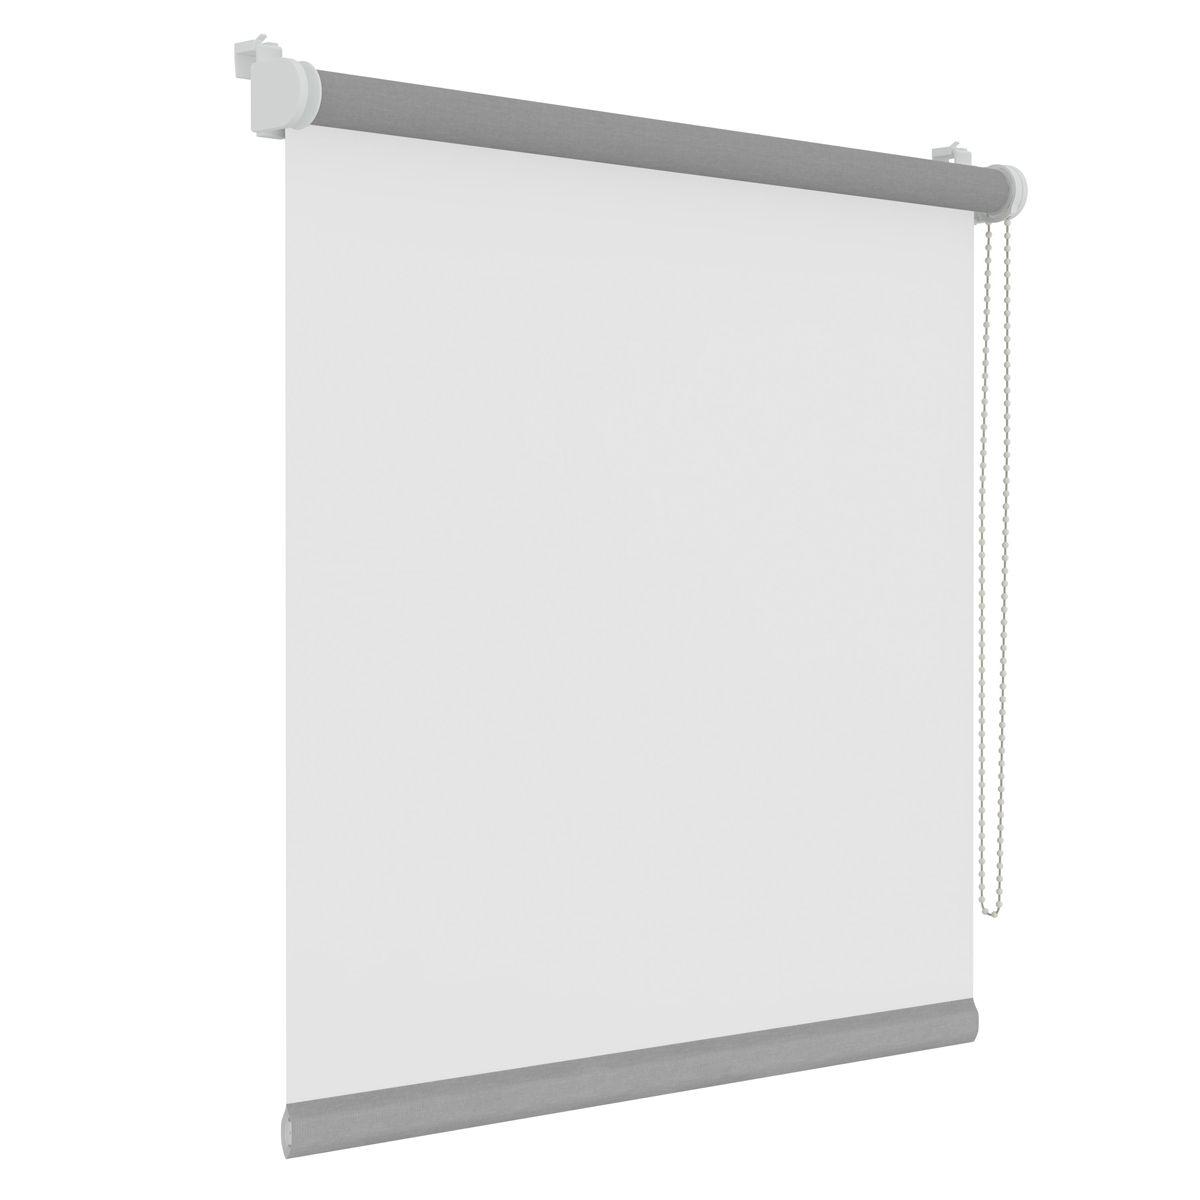 Store enrouleur Myrdall blanc 72x250cm